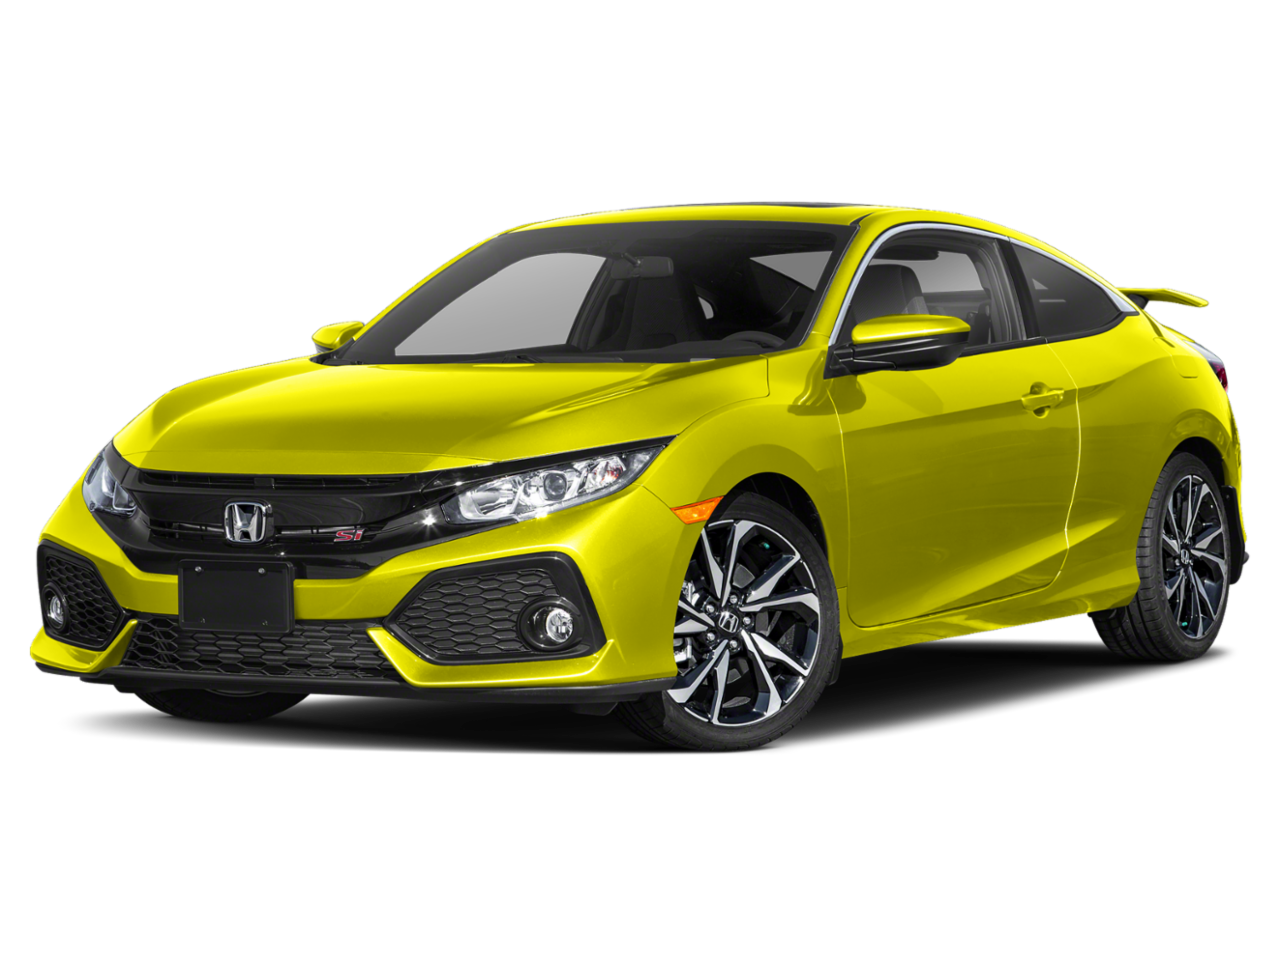 Honda 2019 Civic Si Coupe Manual w/Summer Tires